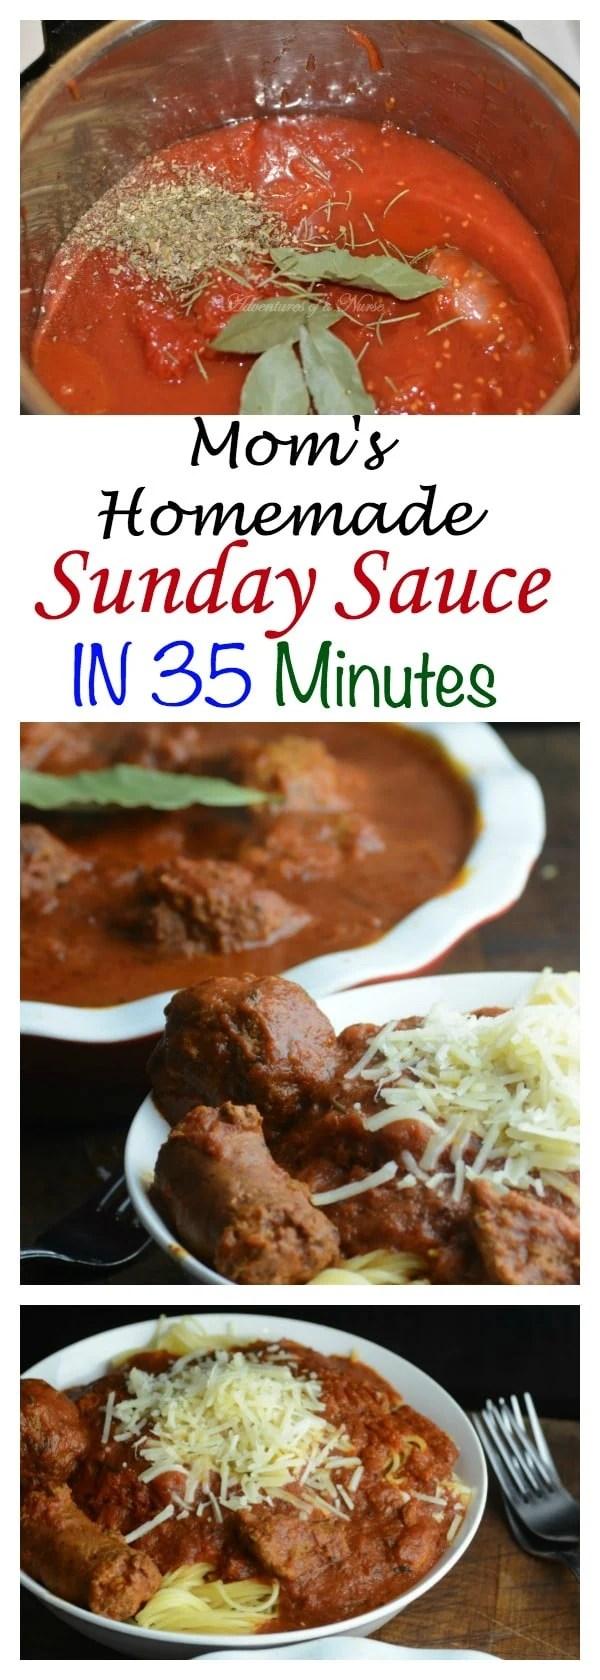 Homemade Sunday Sauce